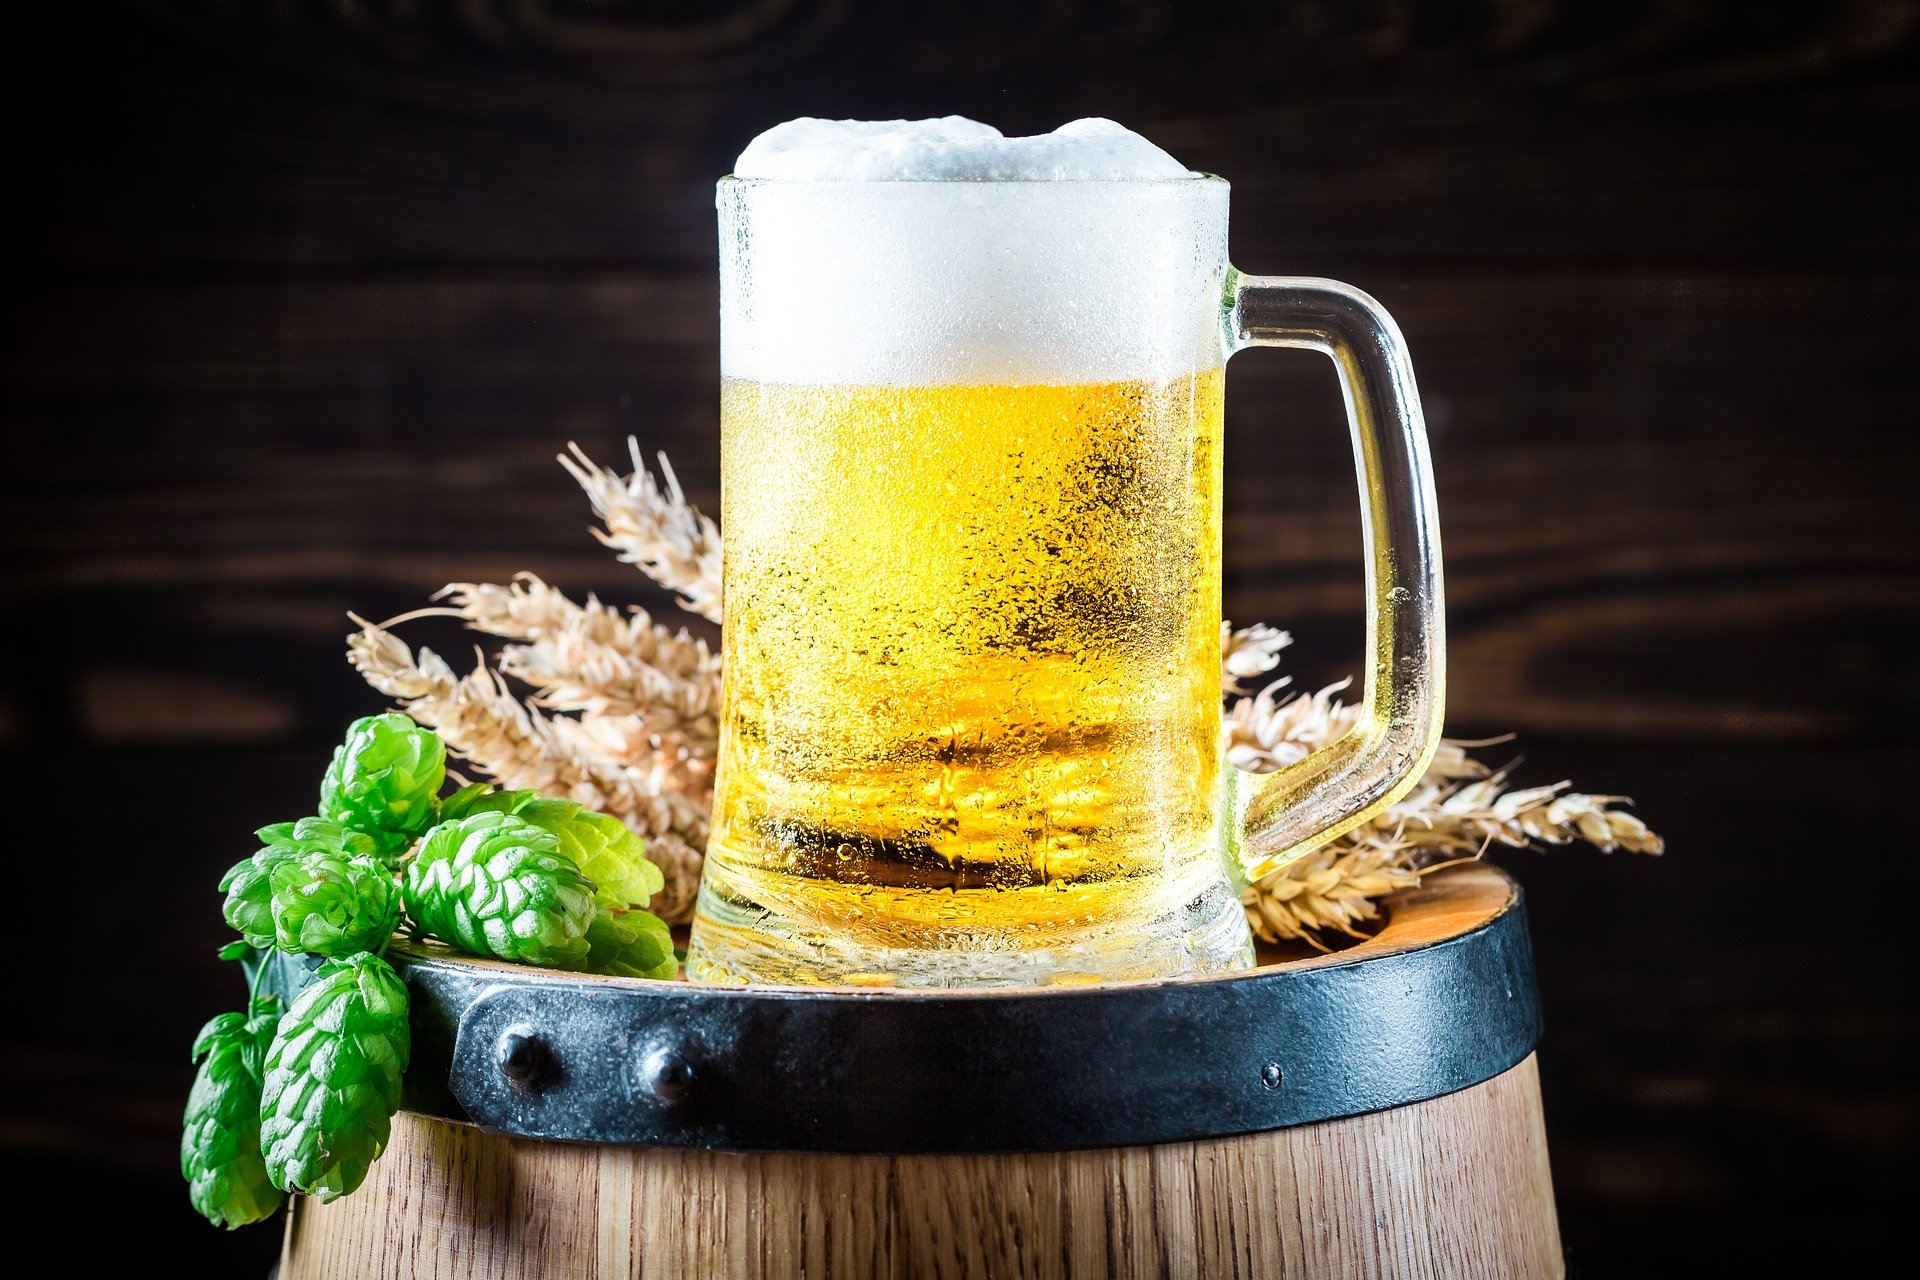 Pixabay/carolineandrade: Nové trendy v kapalinové chromatografii a jejich využití v analýze piva a pivovarských surovin. Část 2. Stanovení cis/trans- izomerů iso-α-hořkých kyselin v pivu metodou ultraúčinné kapalinové chromatografie.